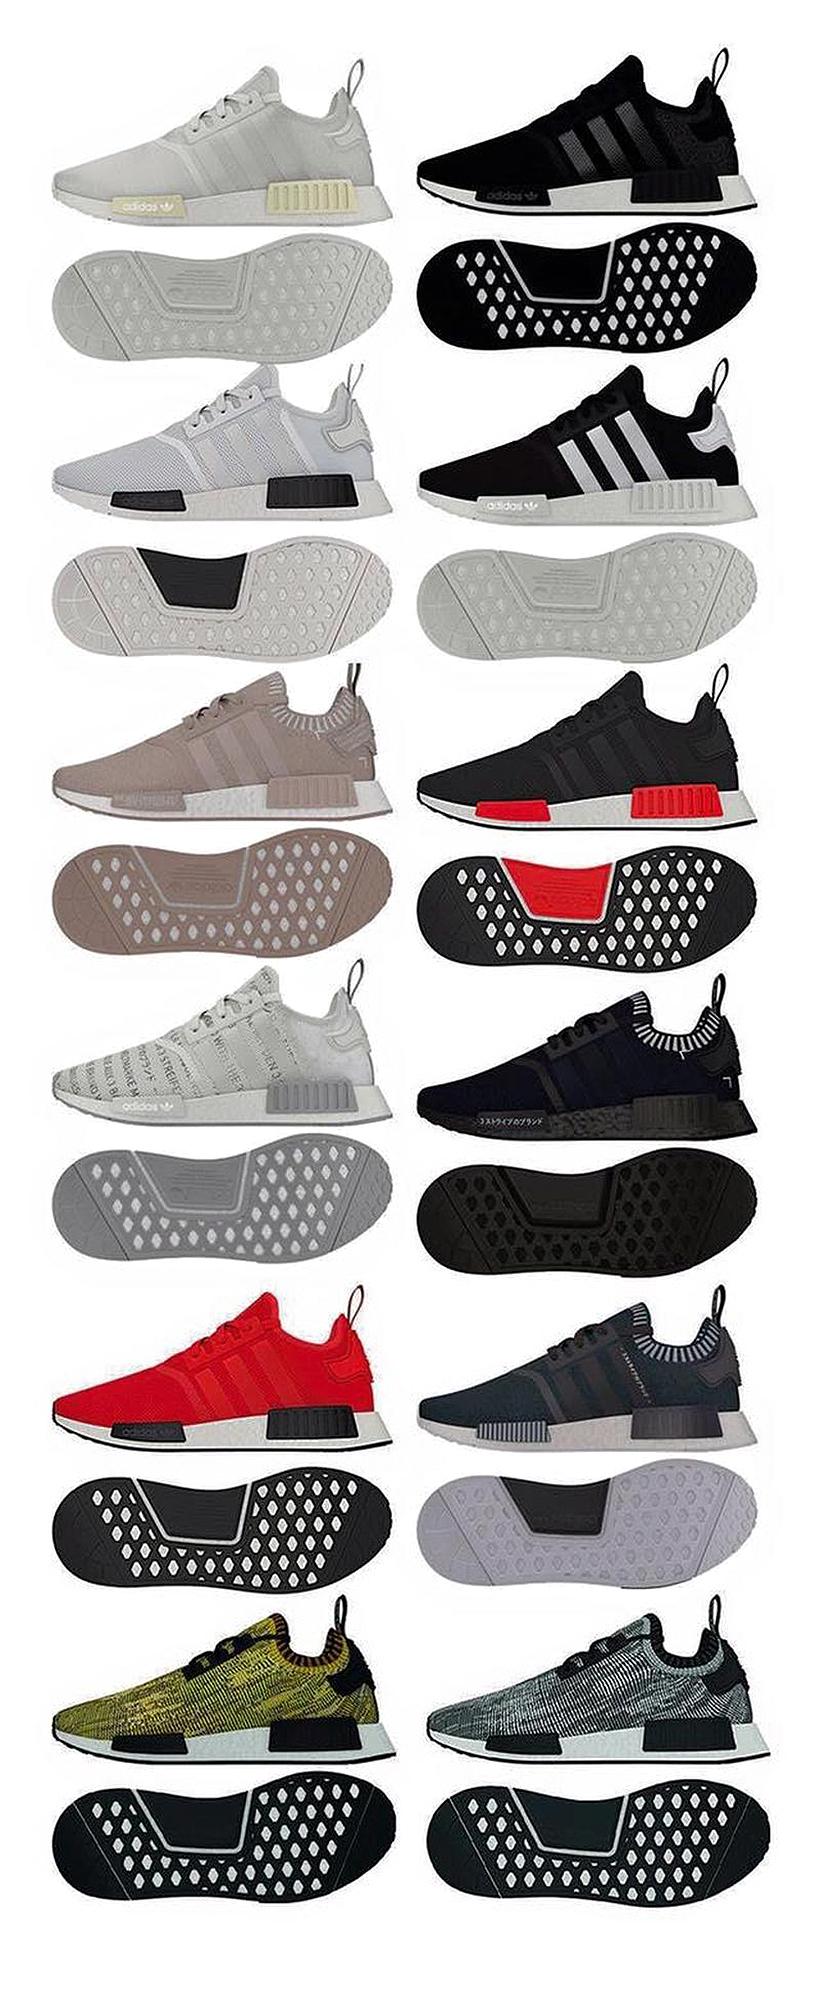 adidas-originals-nmd-2016-releases-2